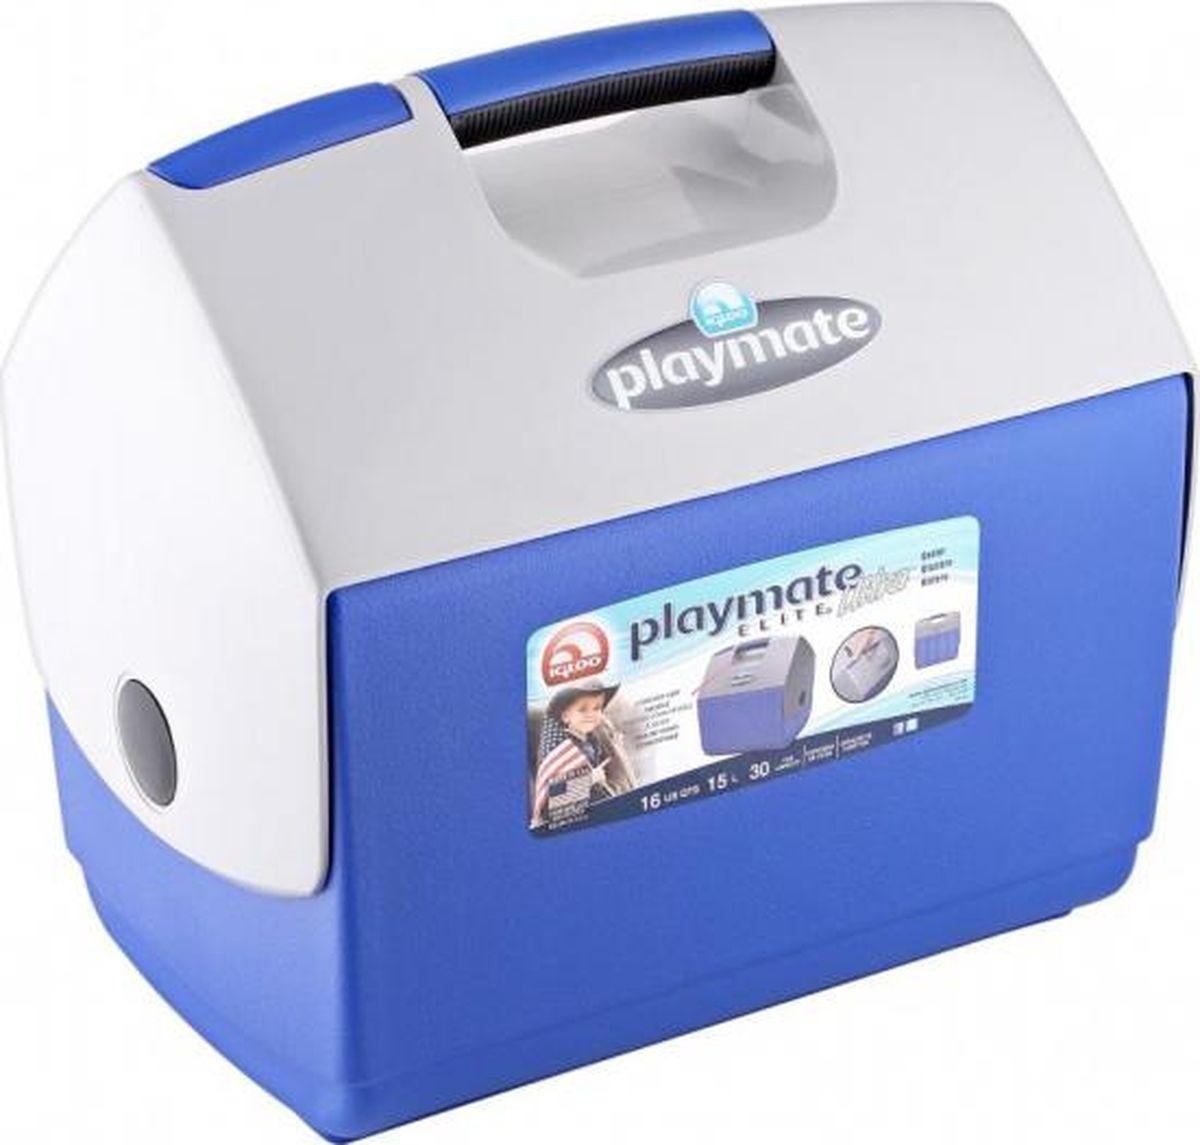 Изотермический контейнер Igloo Playmate, 00043599, синий, 40 х 26 х 38 см igloo изотермический контейнер igloo playmate pal jucetwh